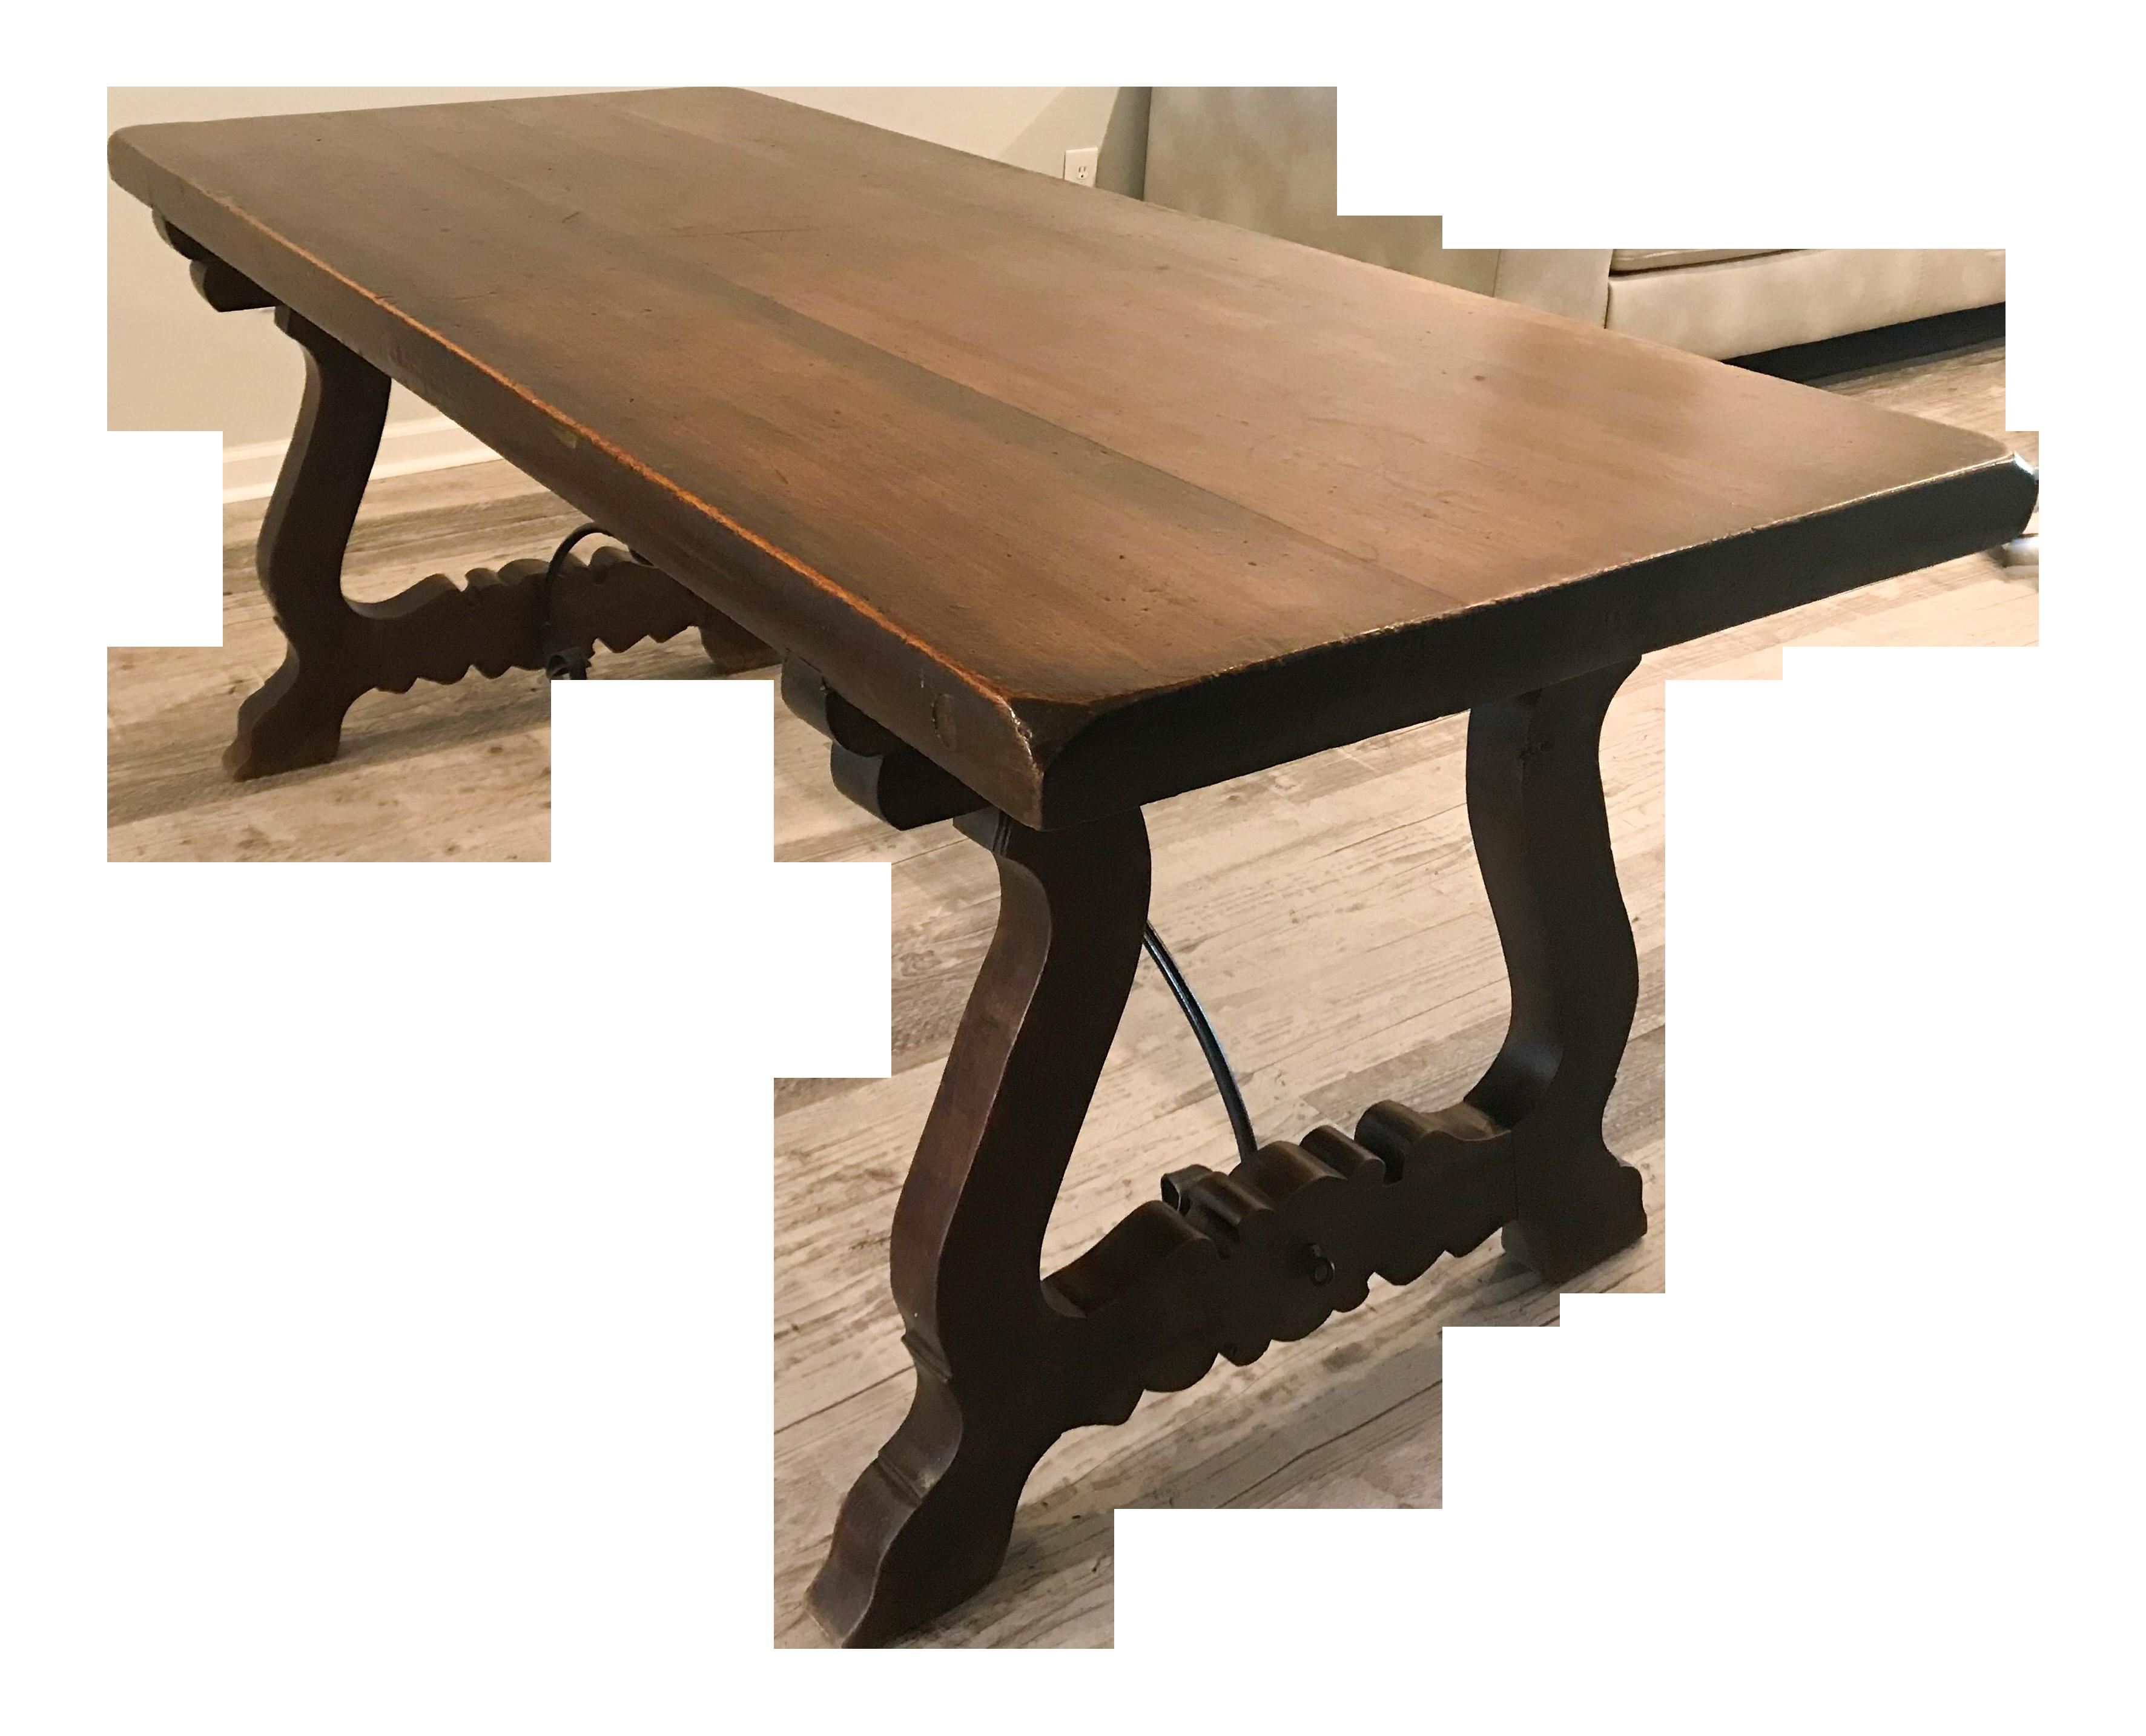 Vintage Spanish Farm Trestle Table in 2020 | Trestle table ...